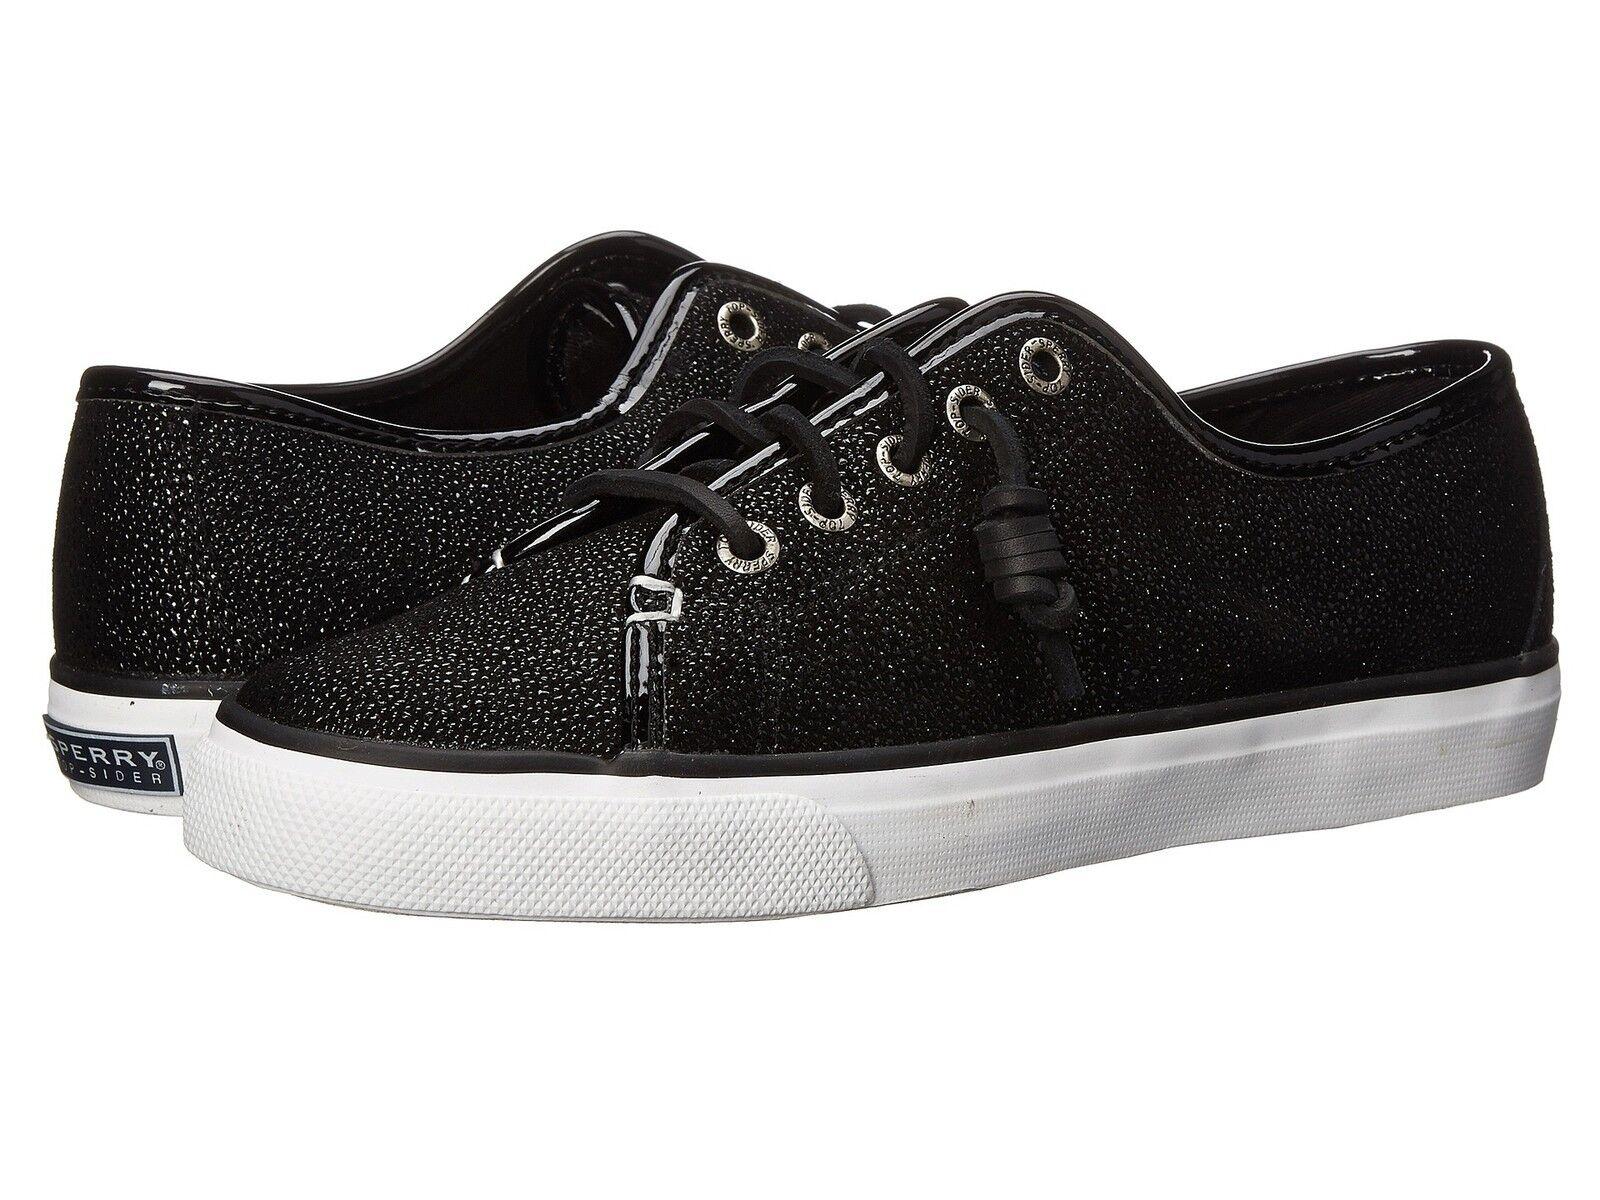 Sperry seacost Cavier Negro Mujeres Lace Lace Lace Up Zapatillas Zapatos Talla 7 M  excelentes precios